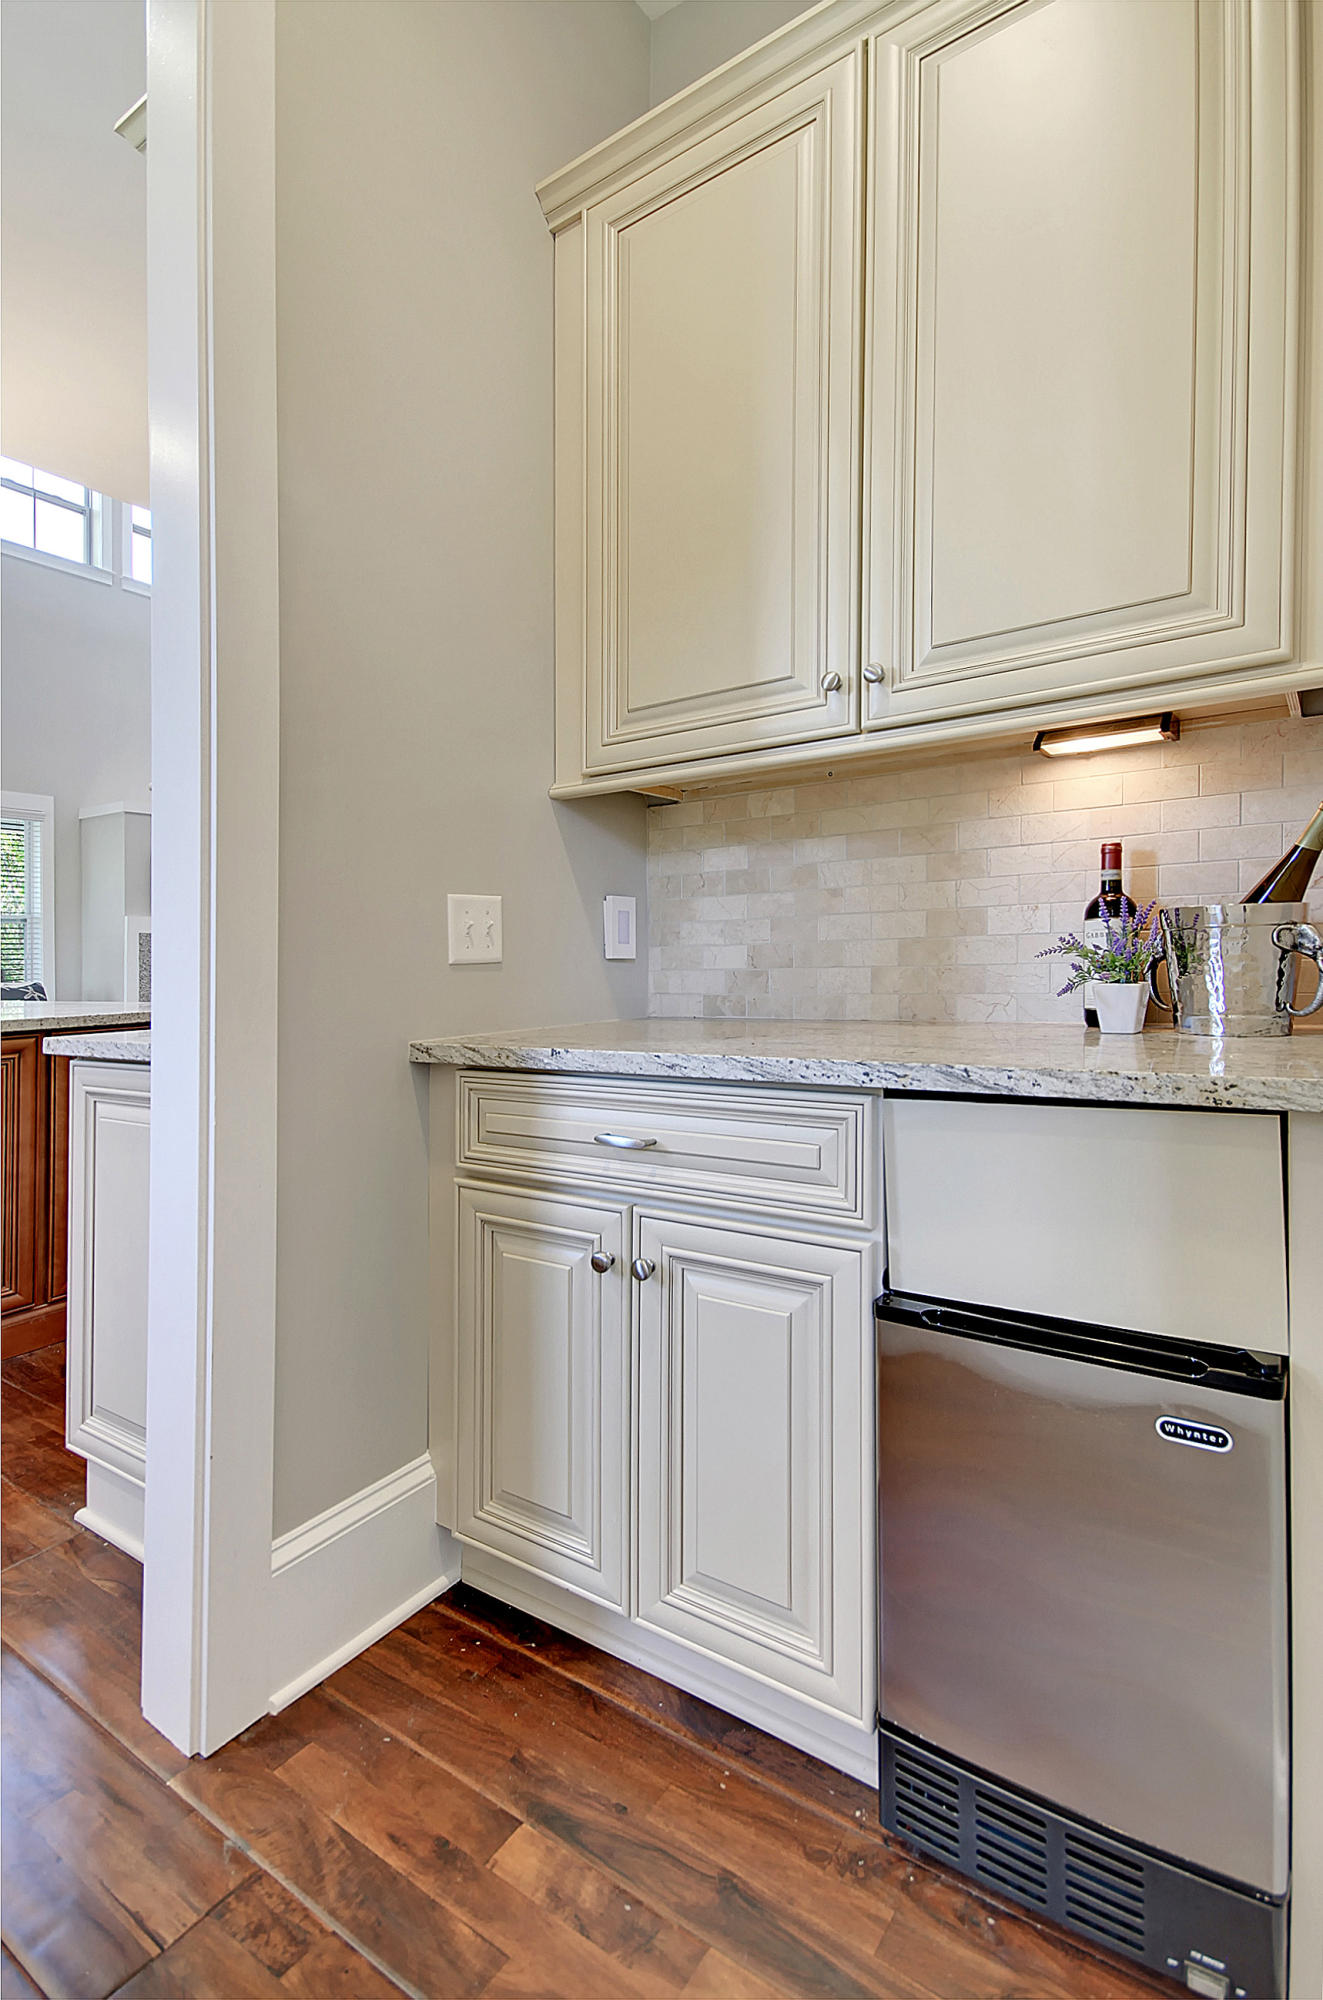 Brickyard Plantation Homes For Sale - 1440 Madison, Mount Pleasant, SC - 15